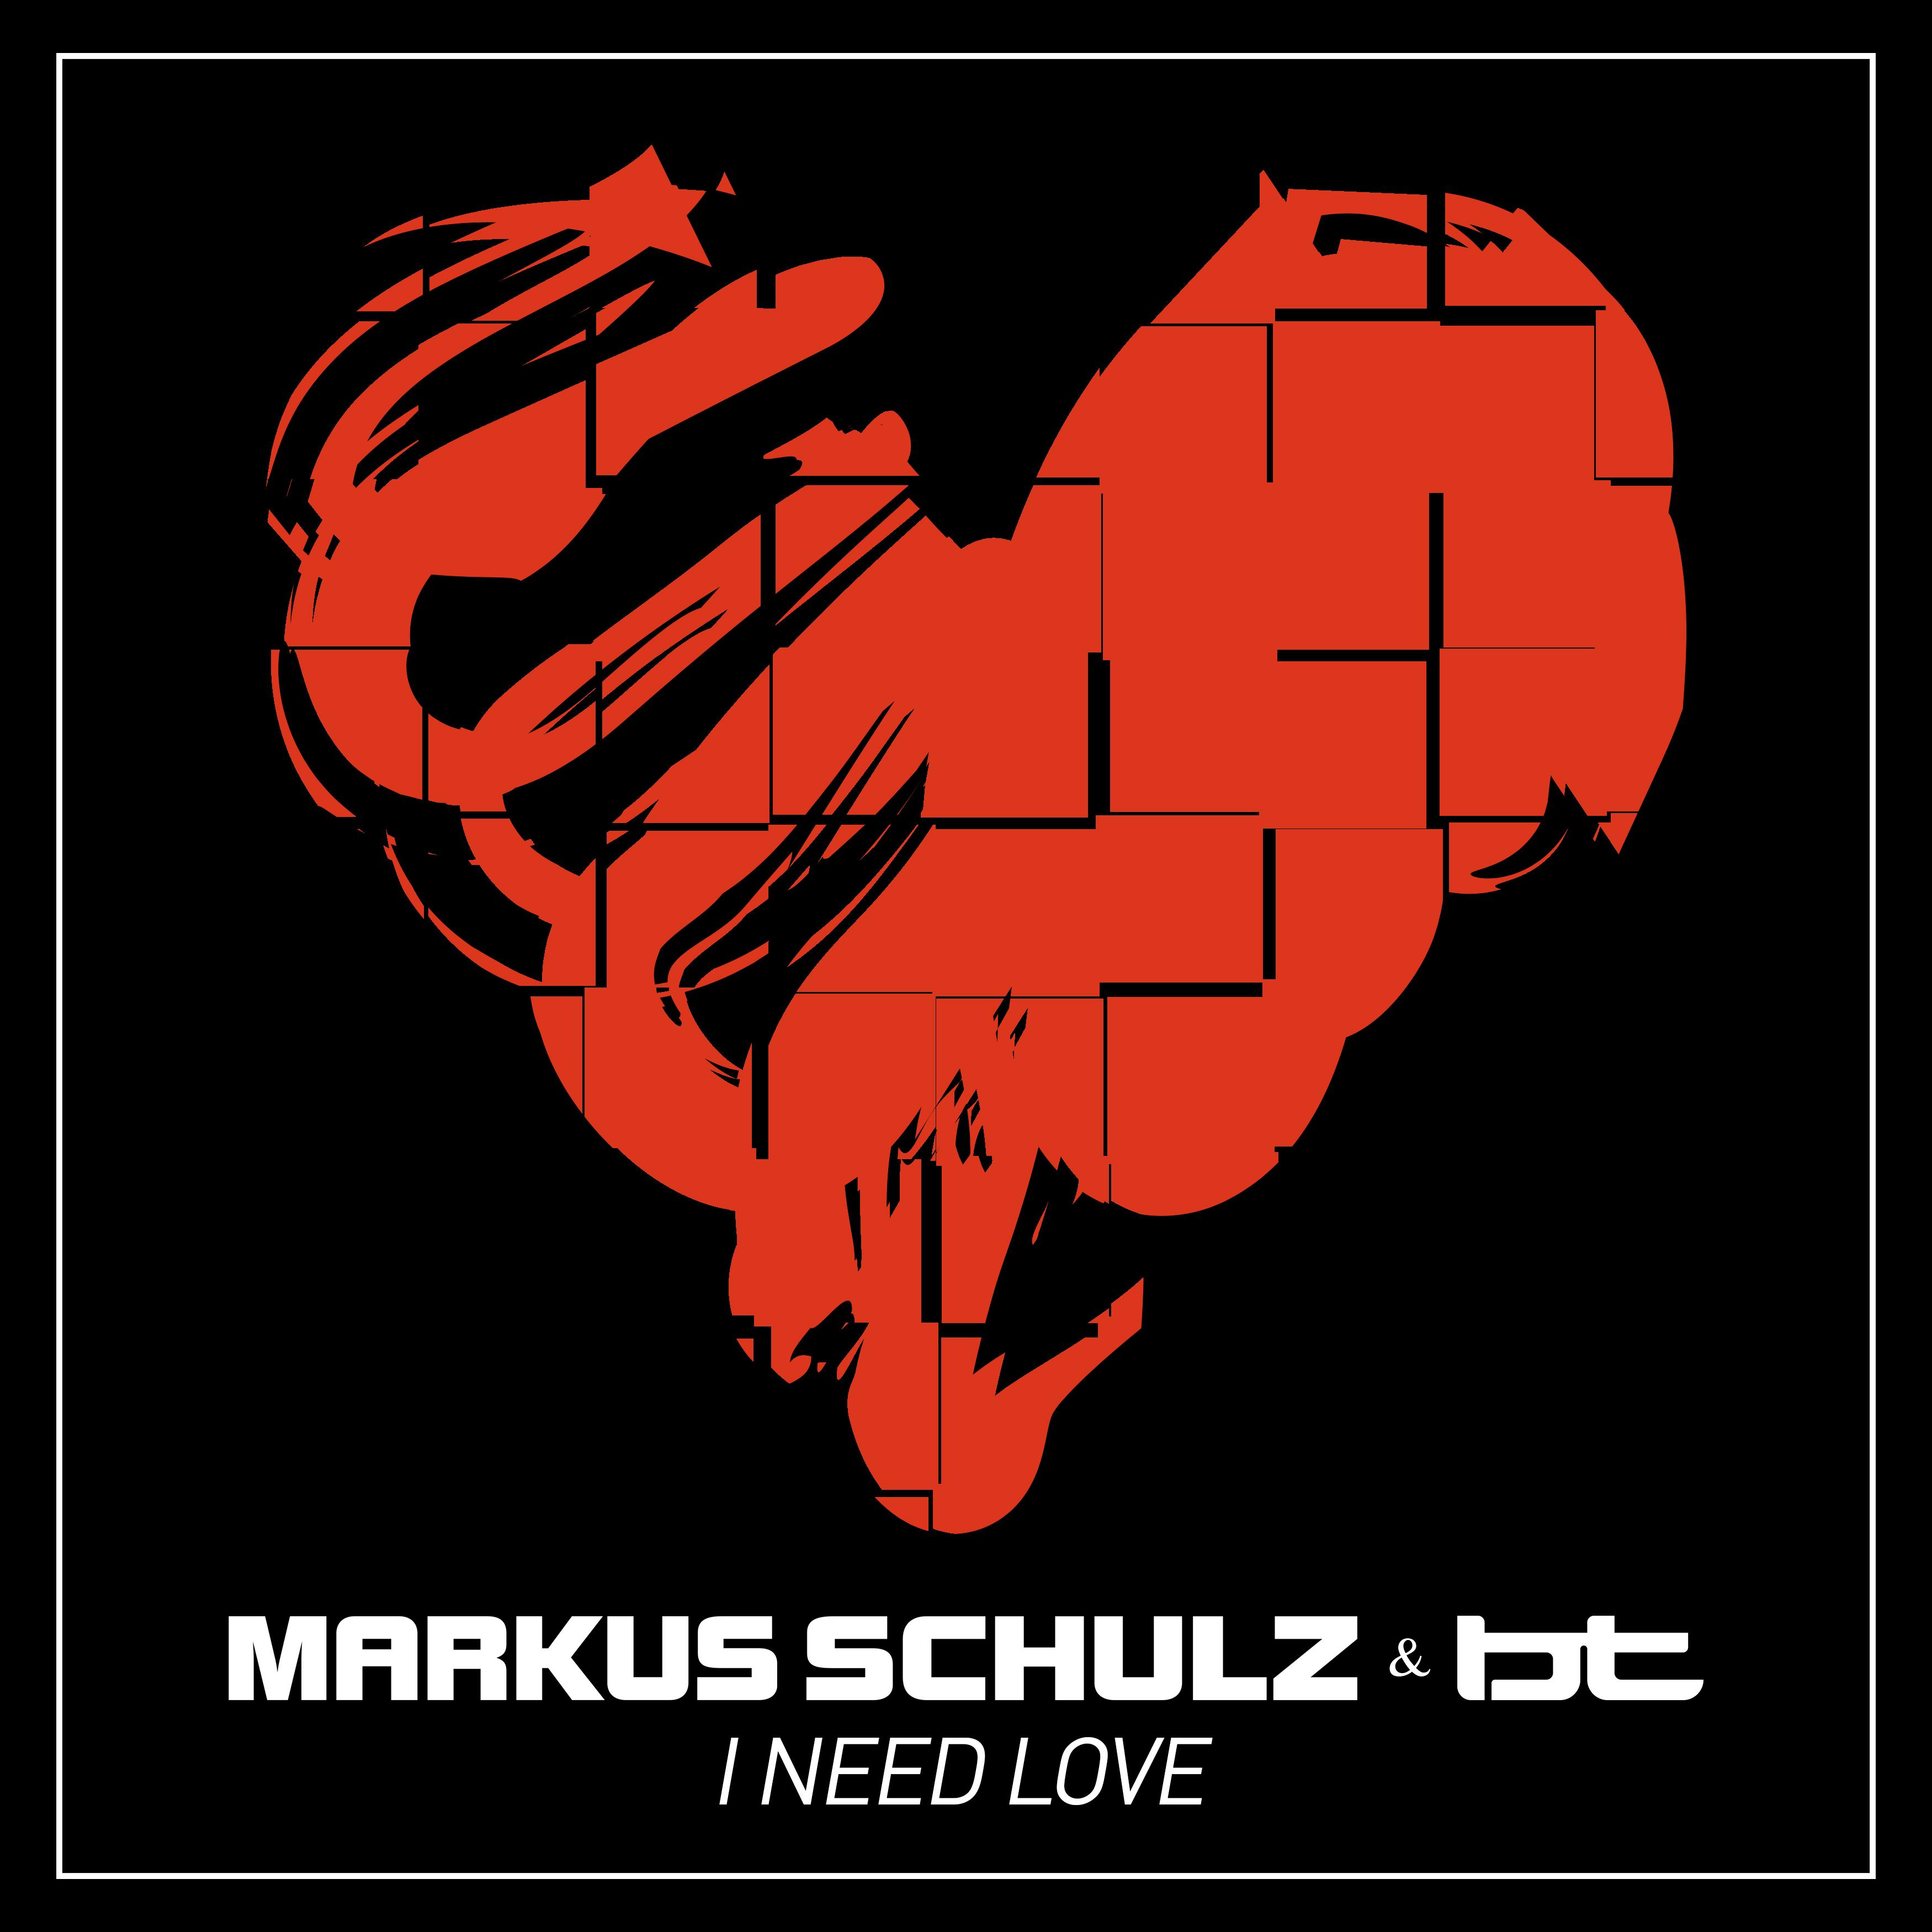 Markus Schulz & BT - I Need Love